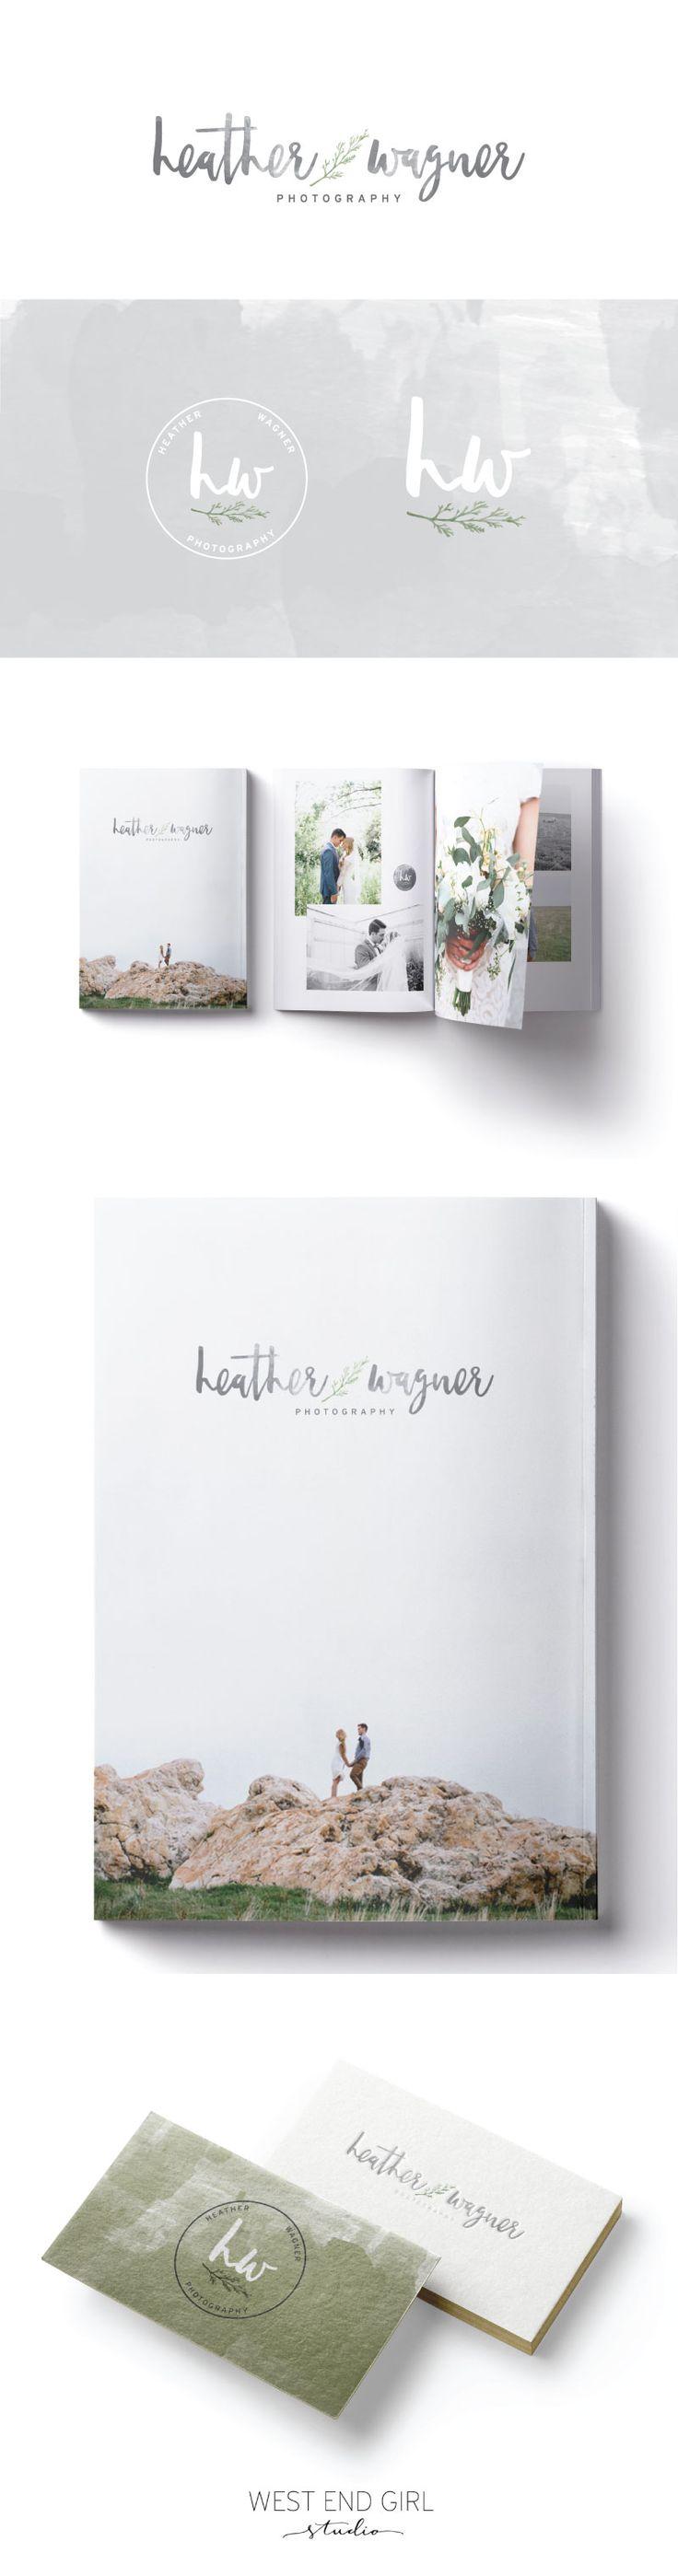 Branding, lifestyle blog design, graphic design, logo, business card design, design, photography logo, watercolor logo